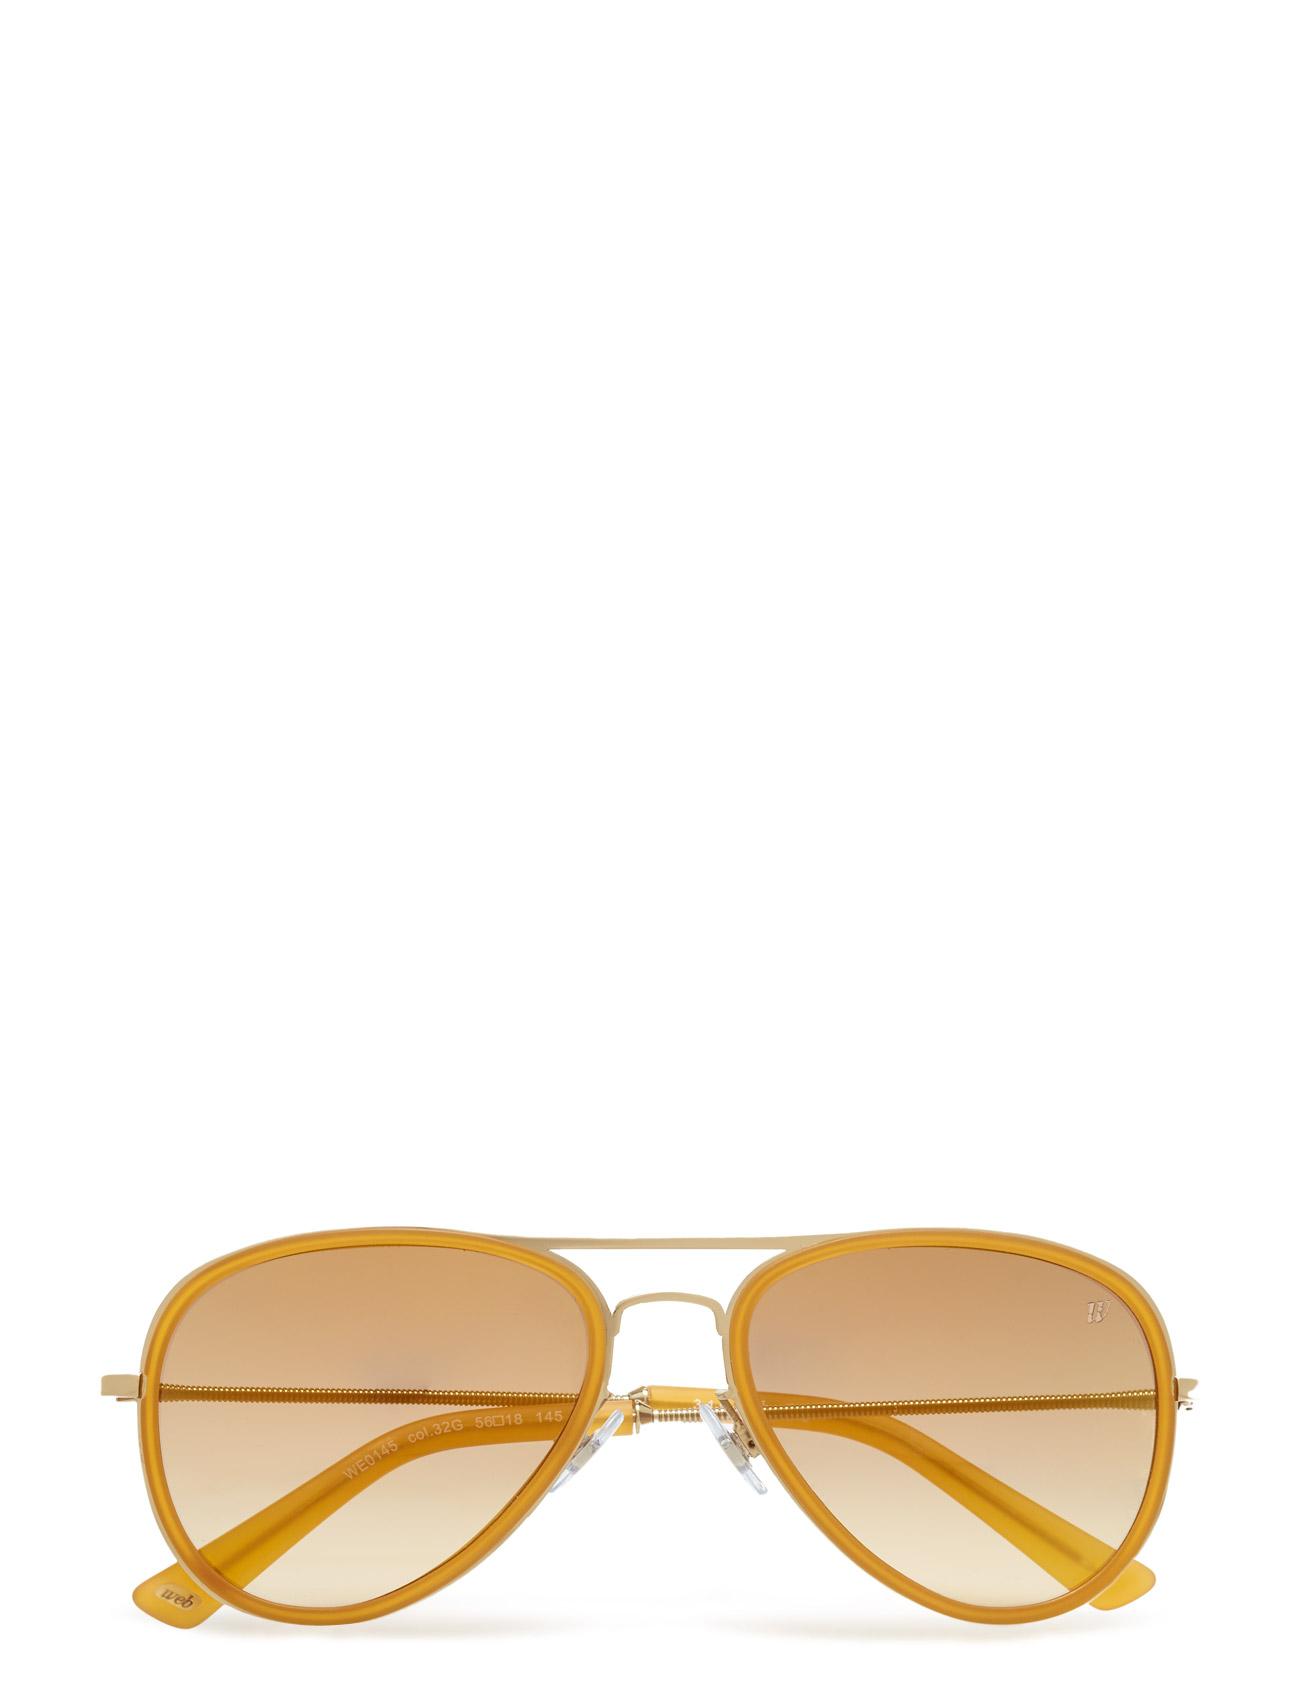 web eyewear – We0145 på boozt.com dk